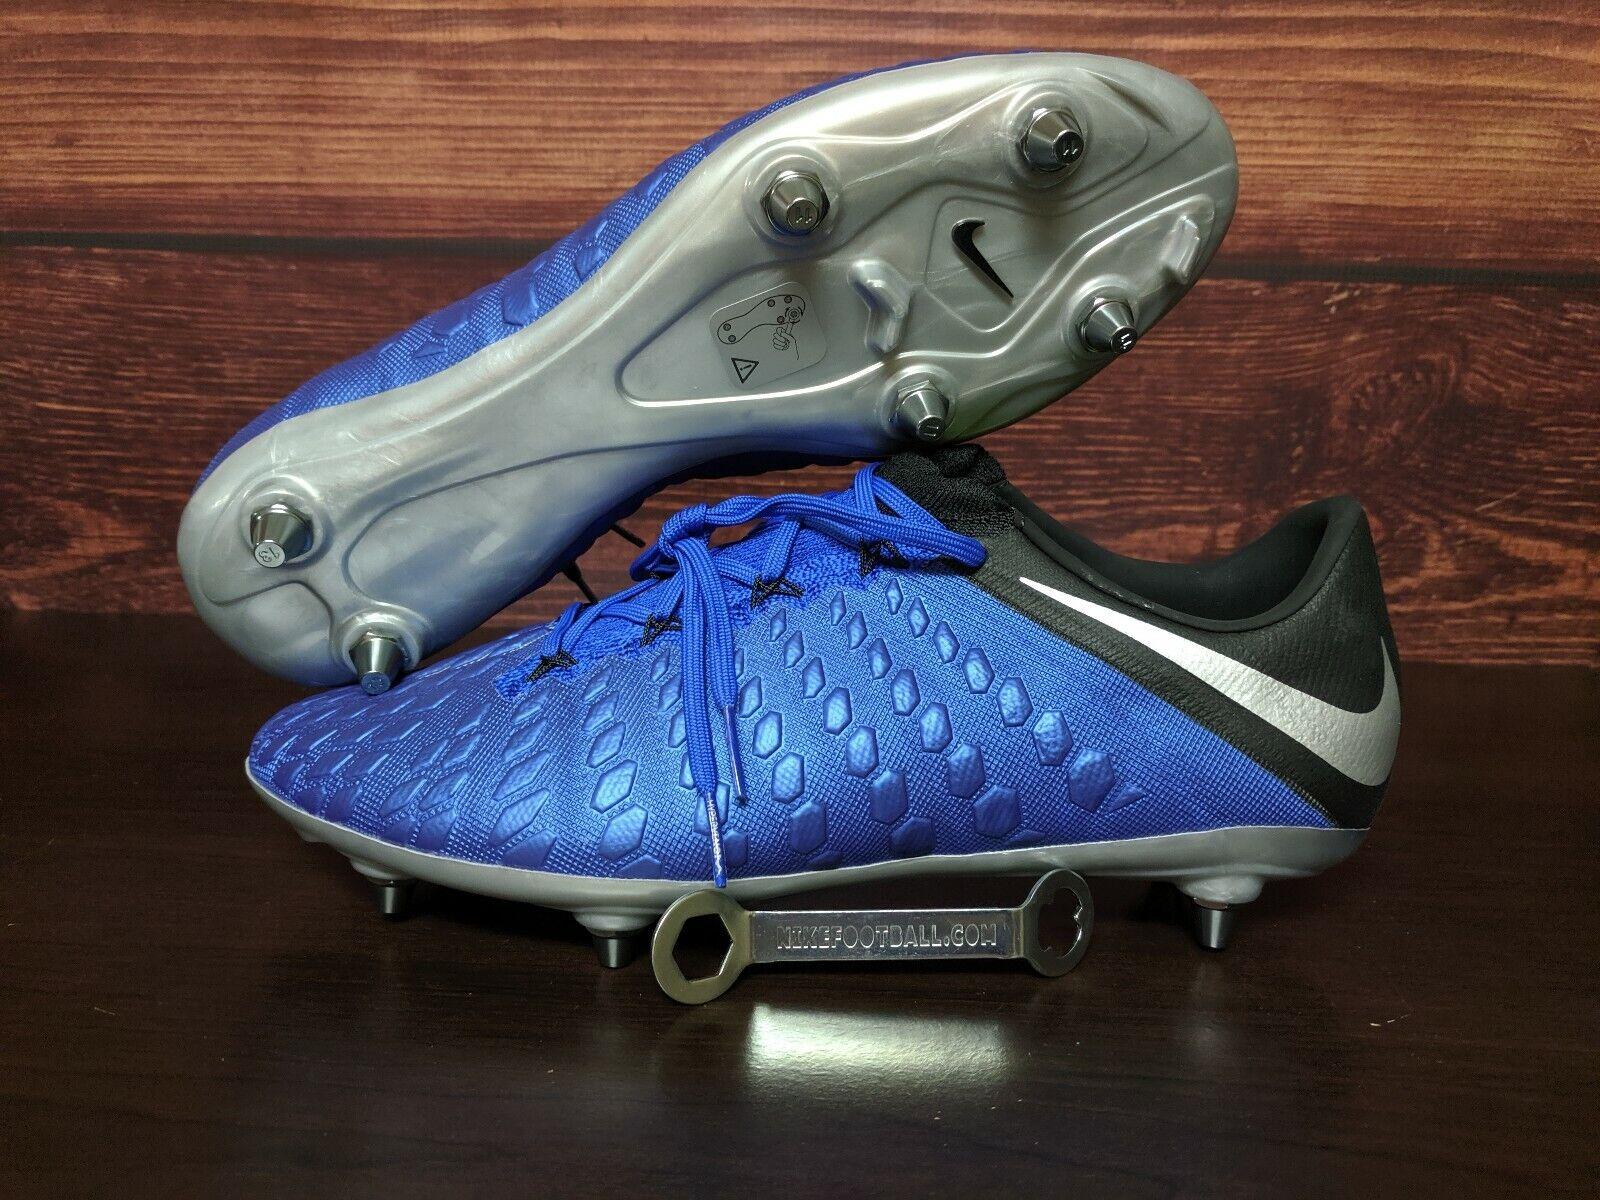 Nike Hypervenom Fantasma 3 Elite tacos SG Pro Hombre 10 AJ6708-401 hecho en Bosnia